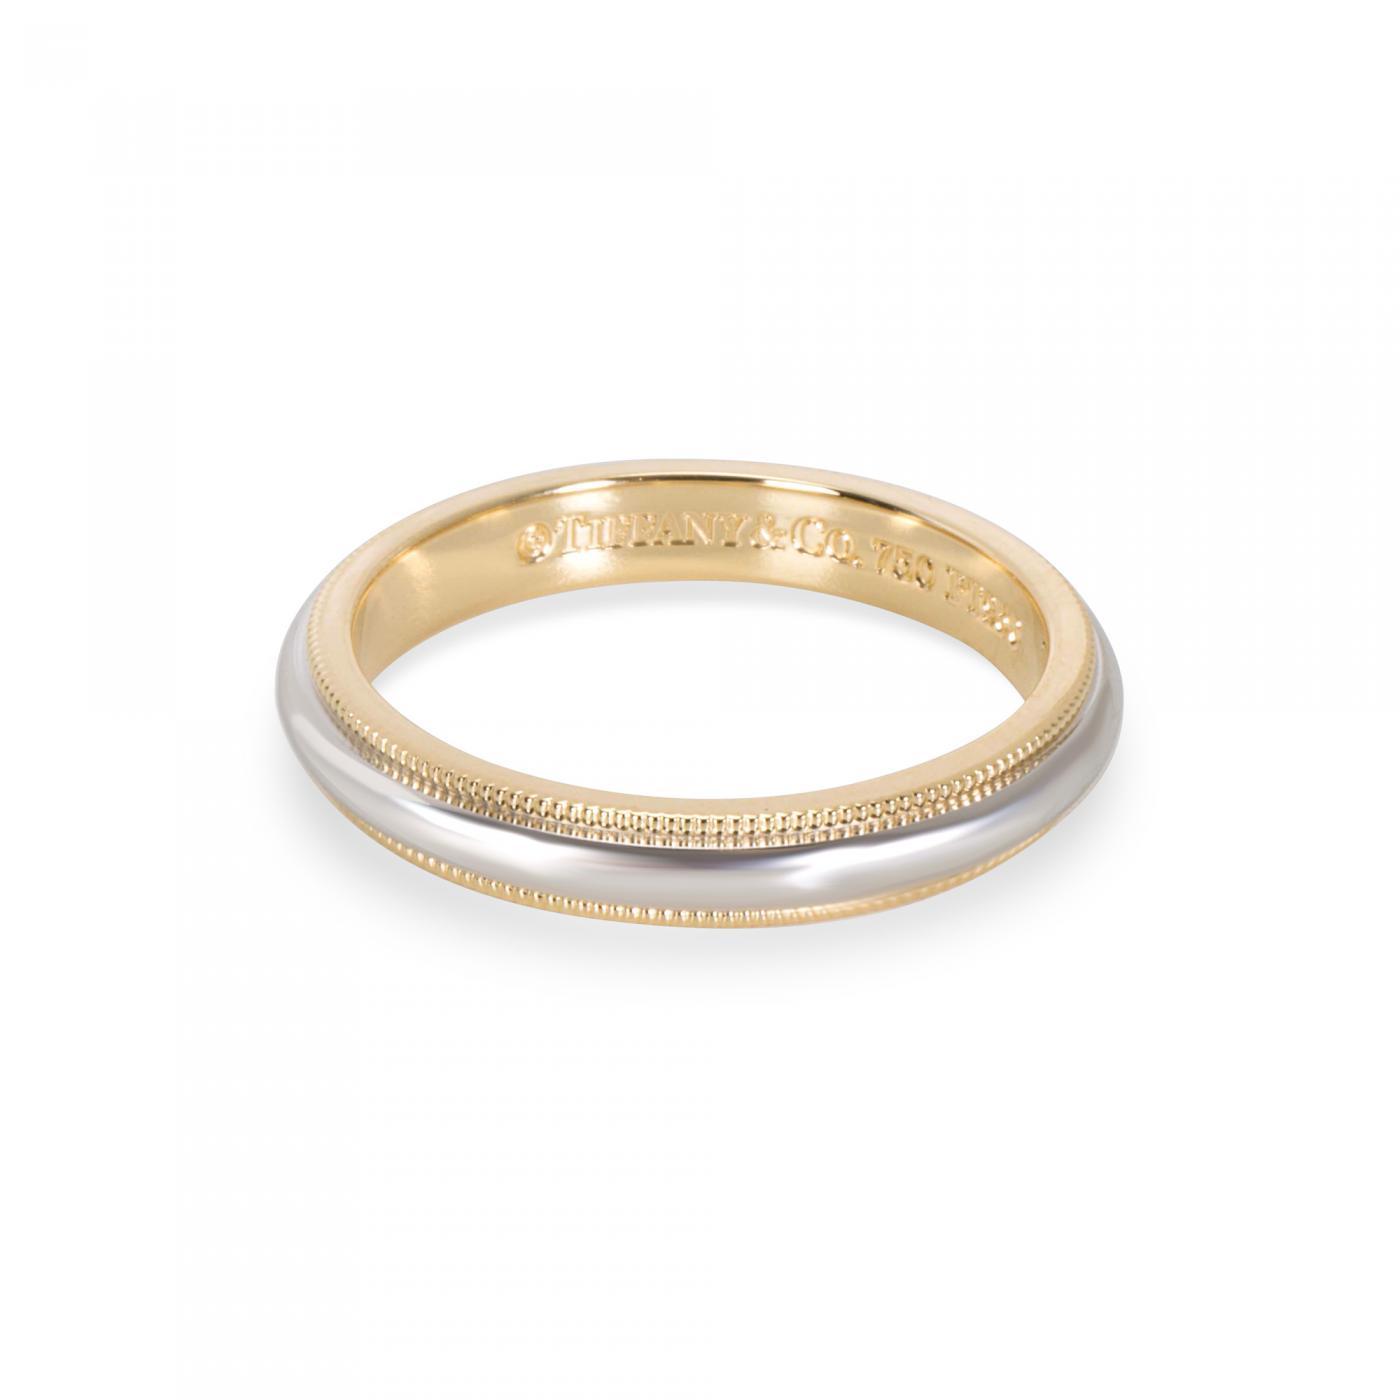 Tiffany And Co Tiffany Co Men S Milgrain Wedding Band In 18k Yellow Gold Platinum